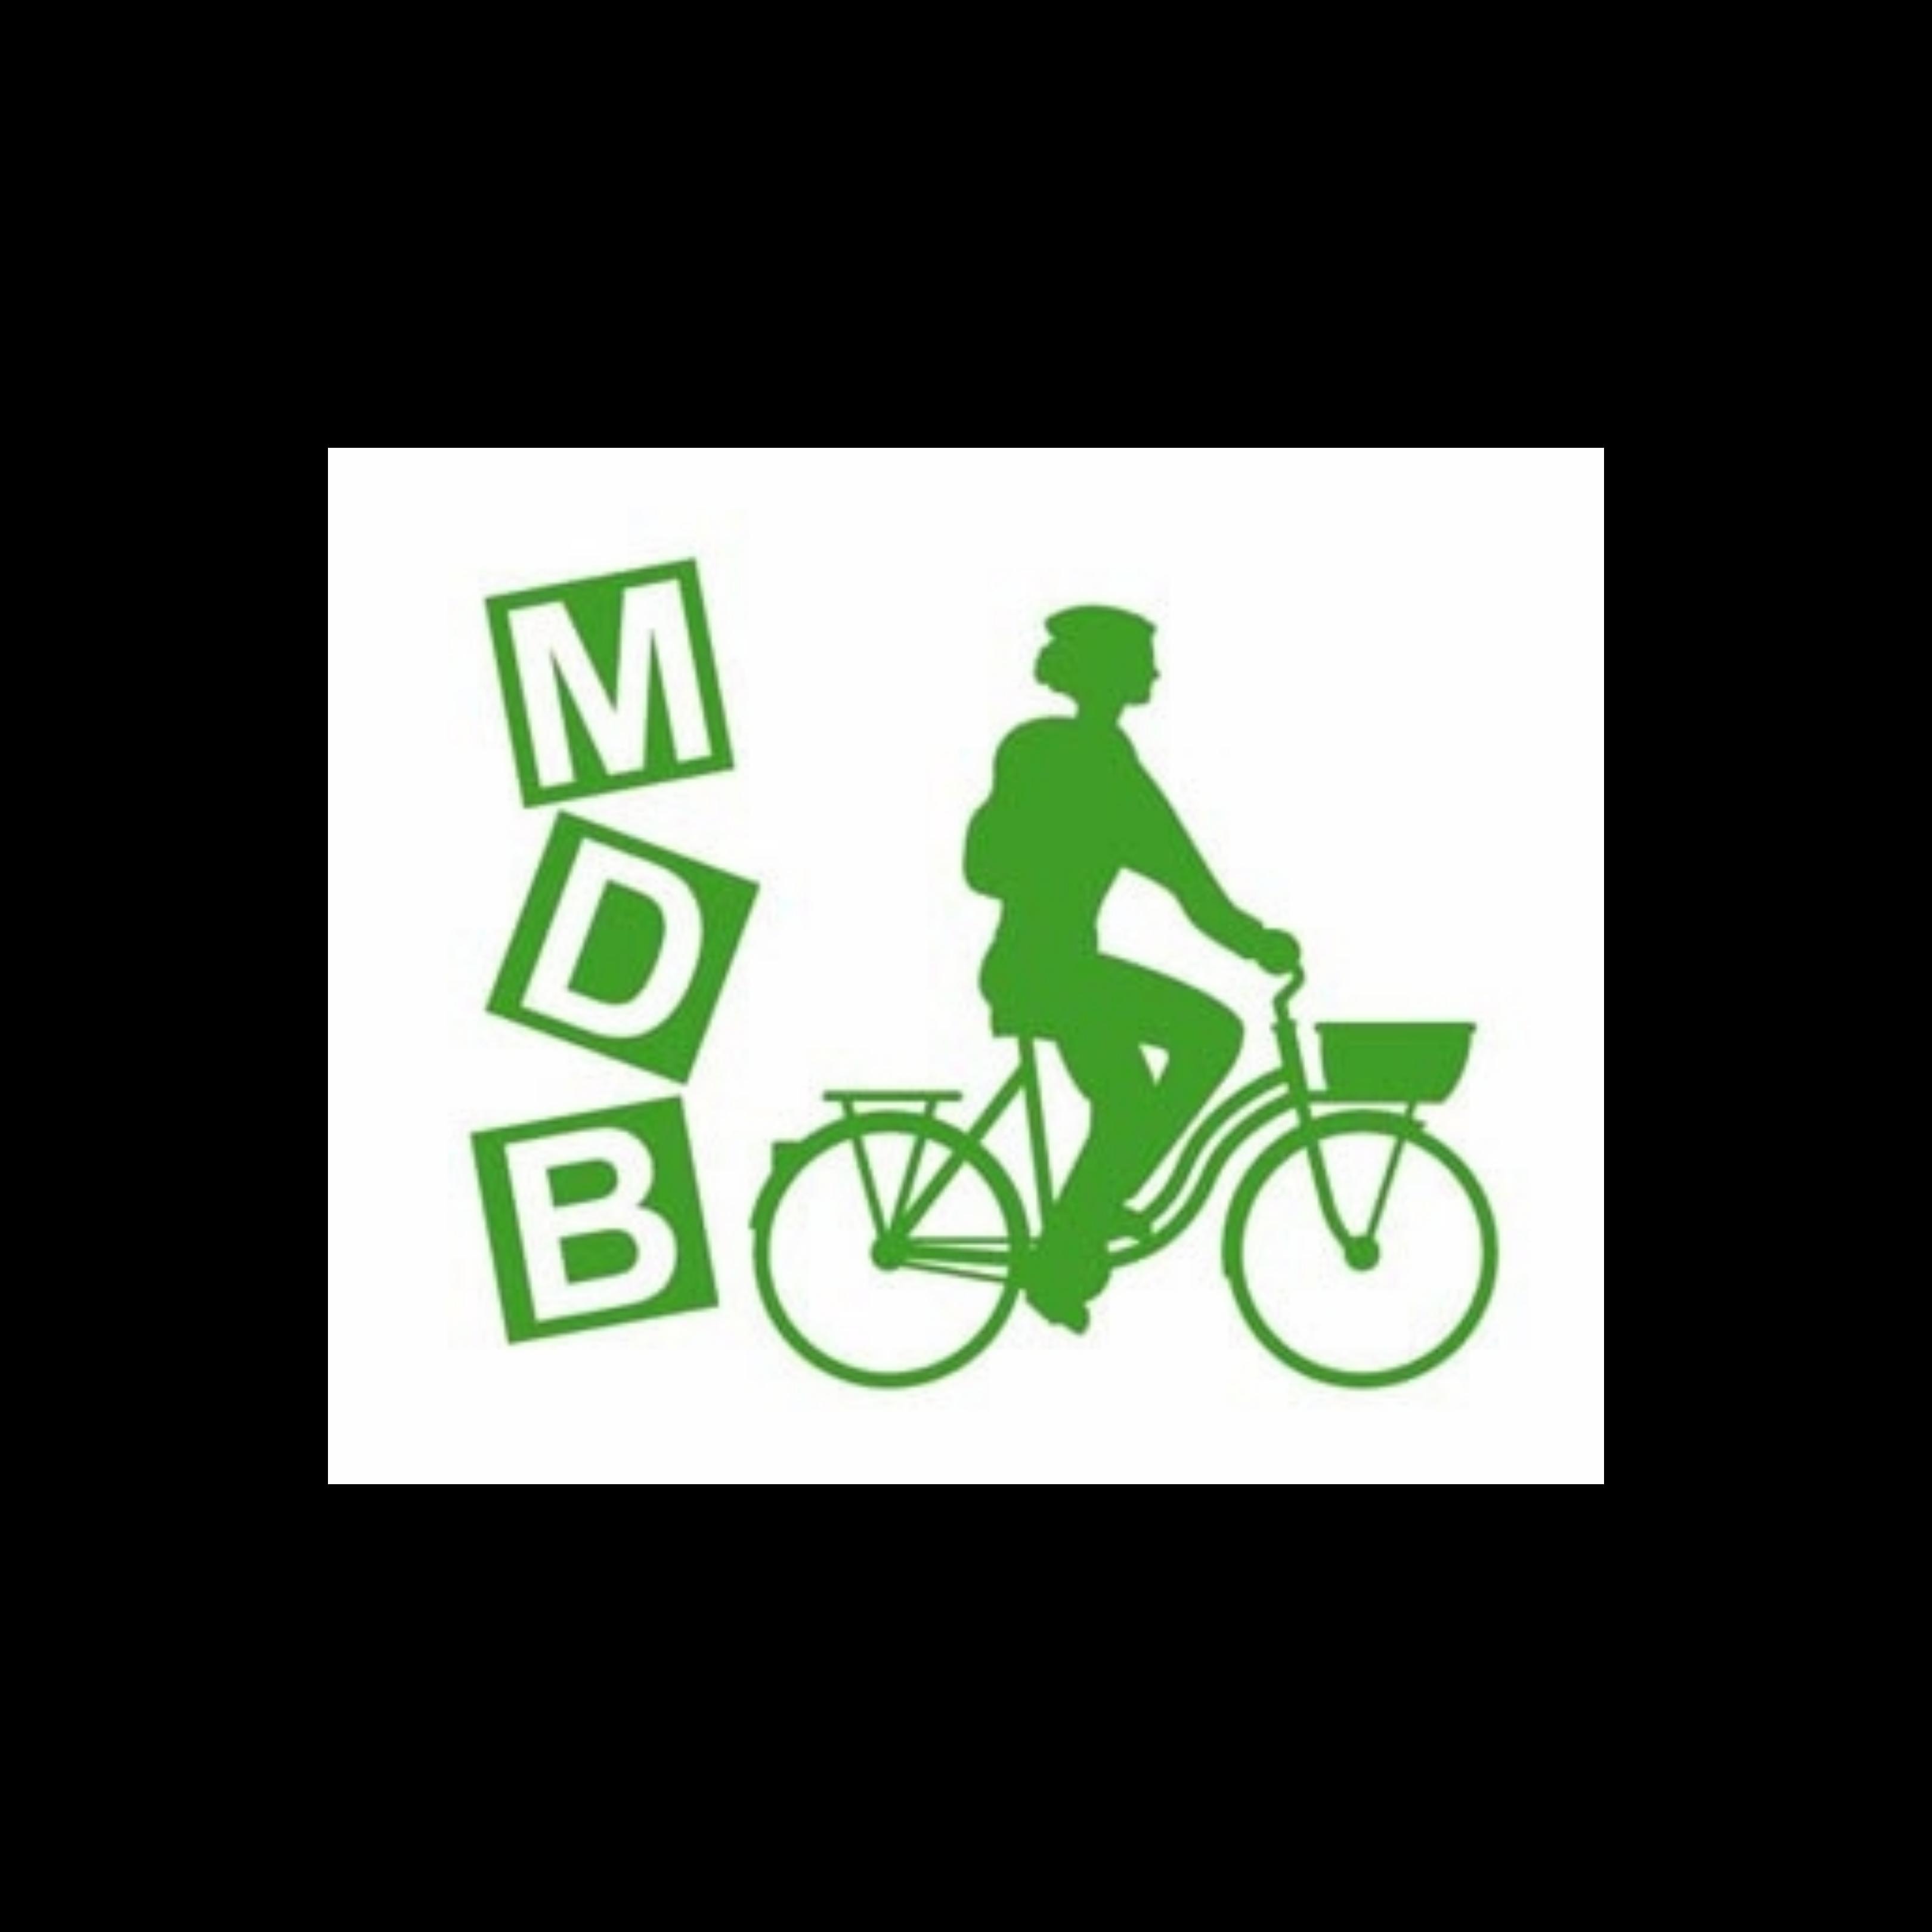 MDB png